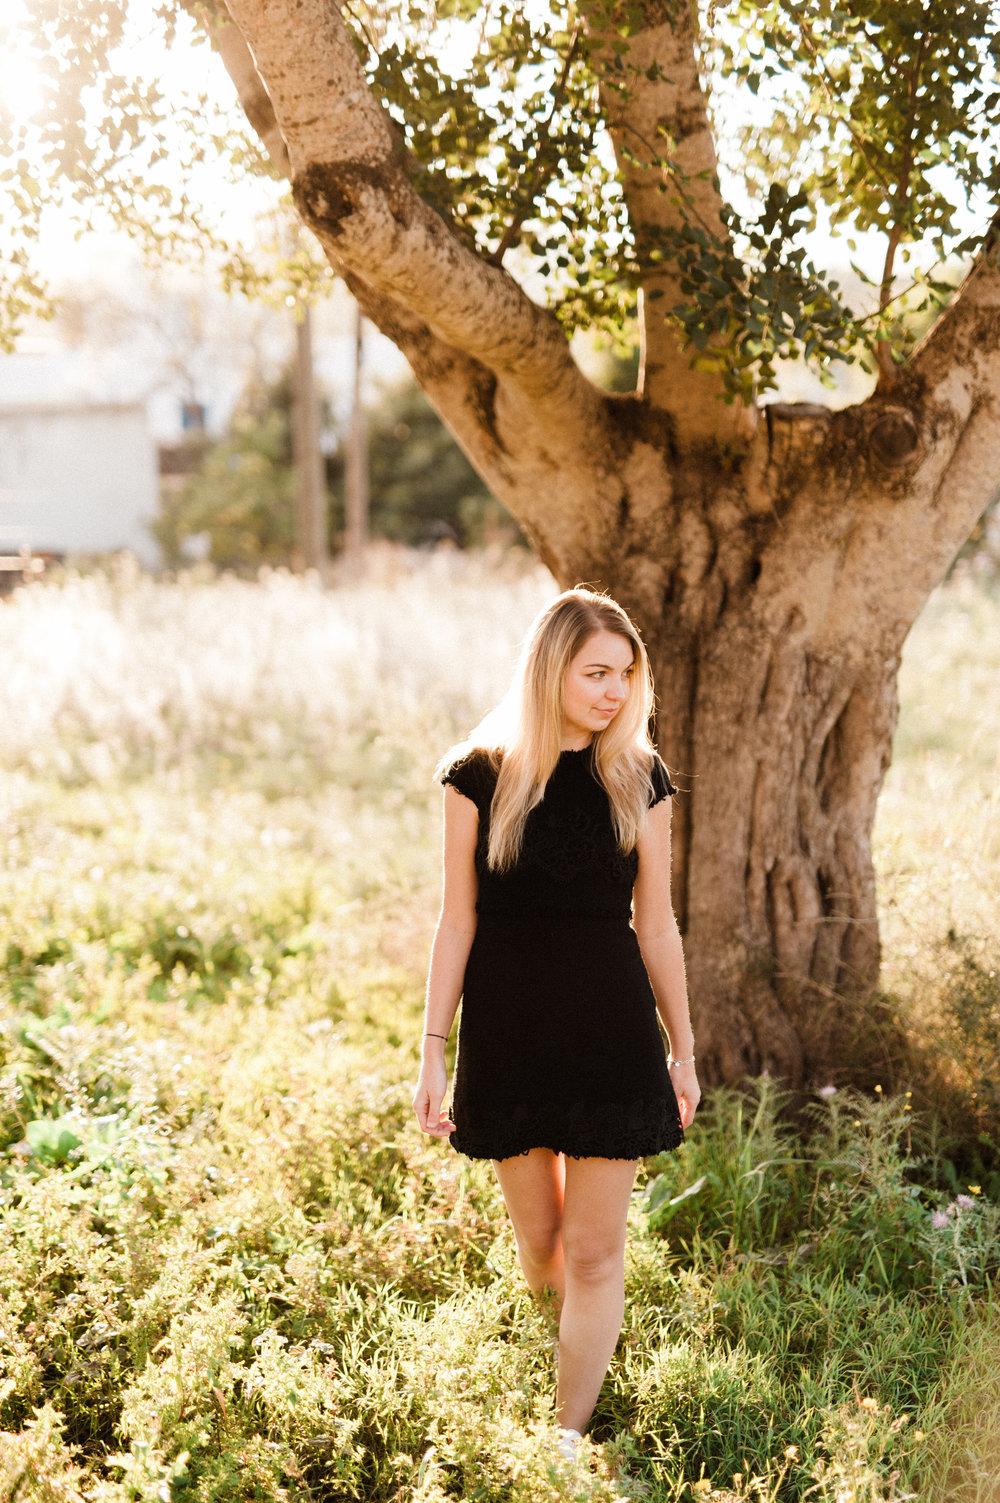 JenniferArndtPhotography(4of15).jpg